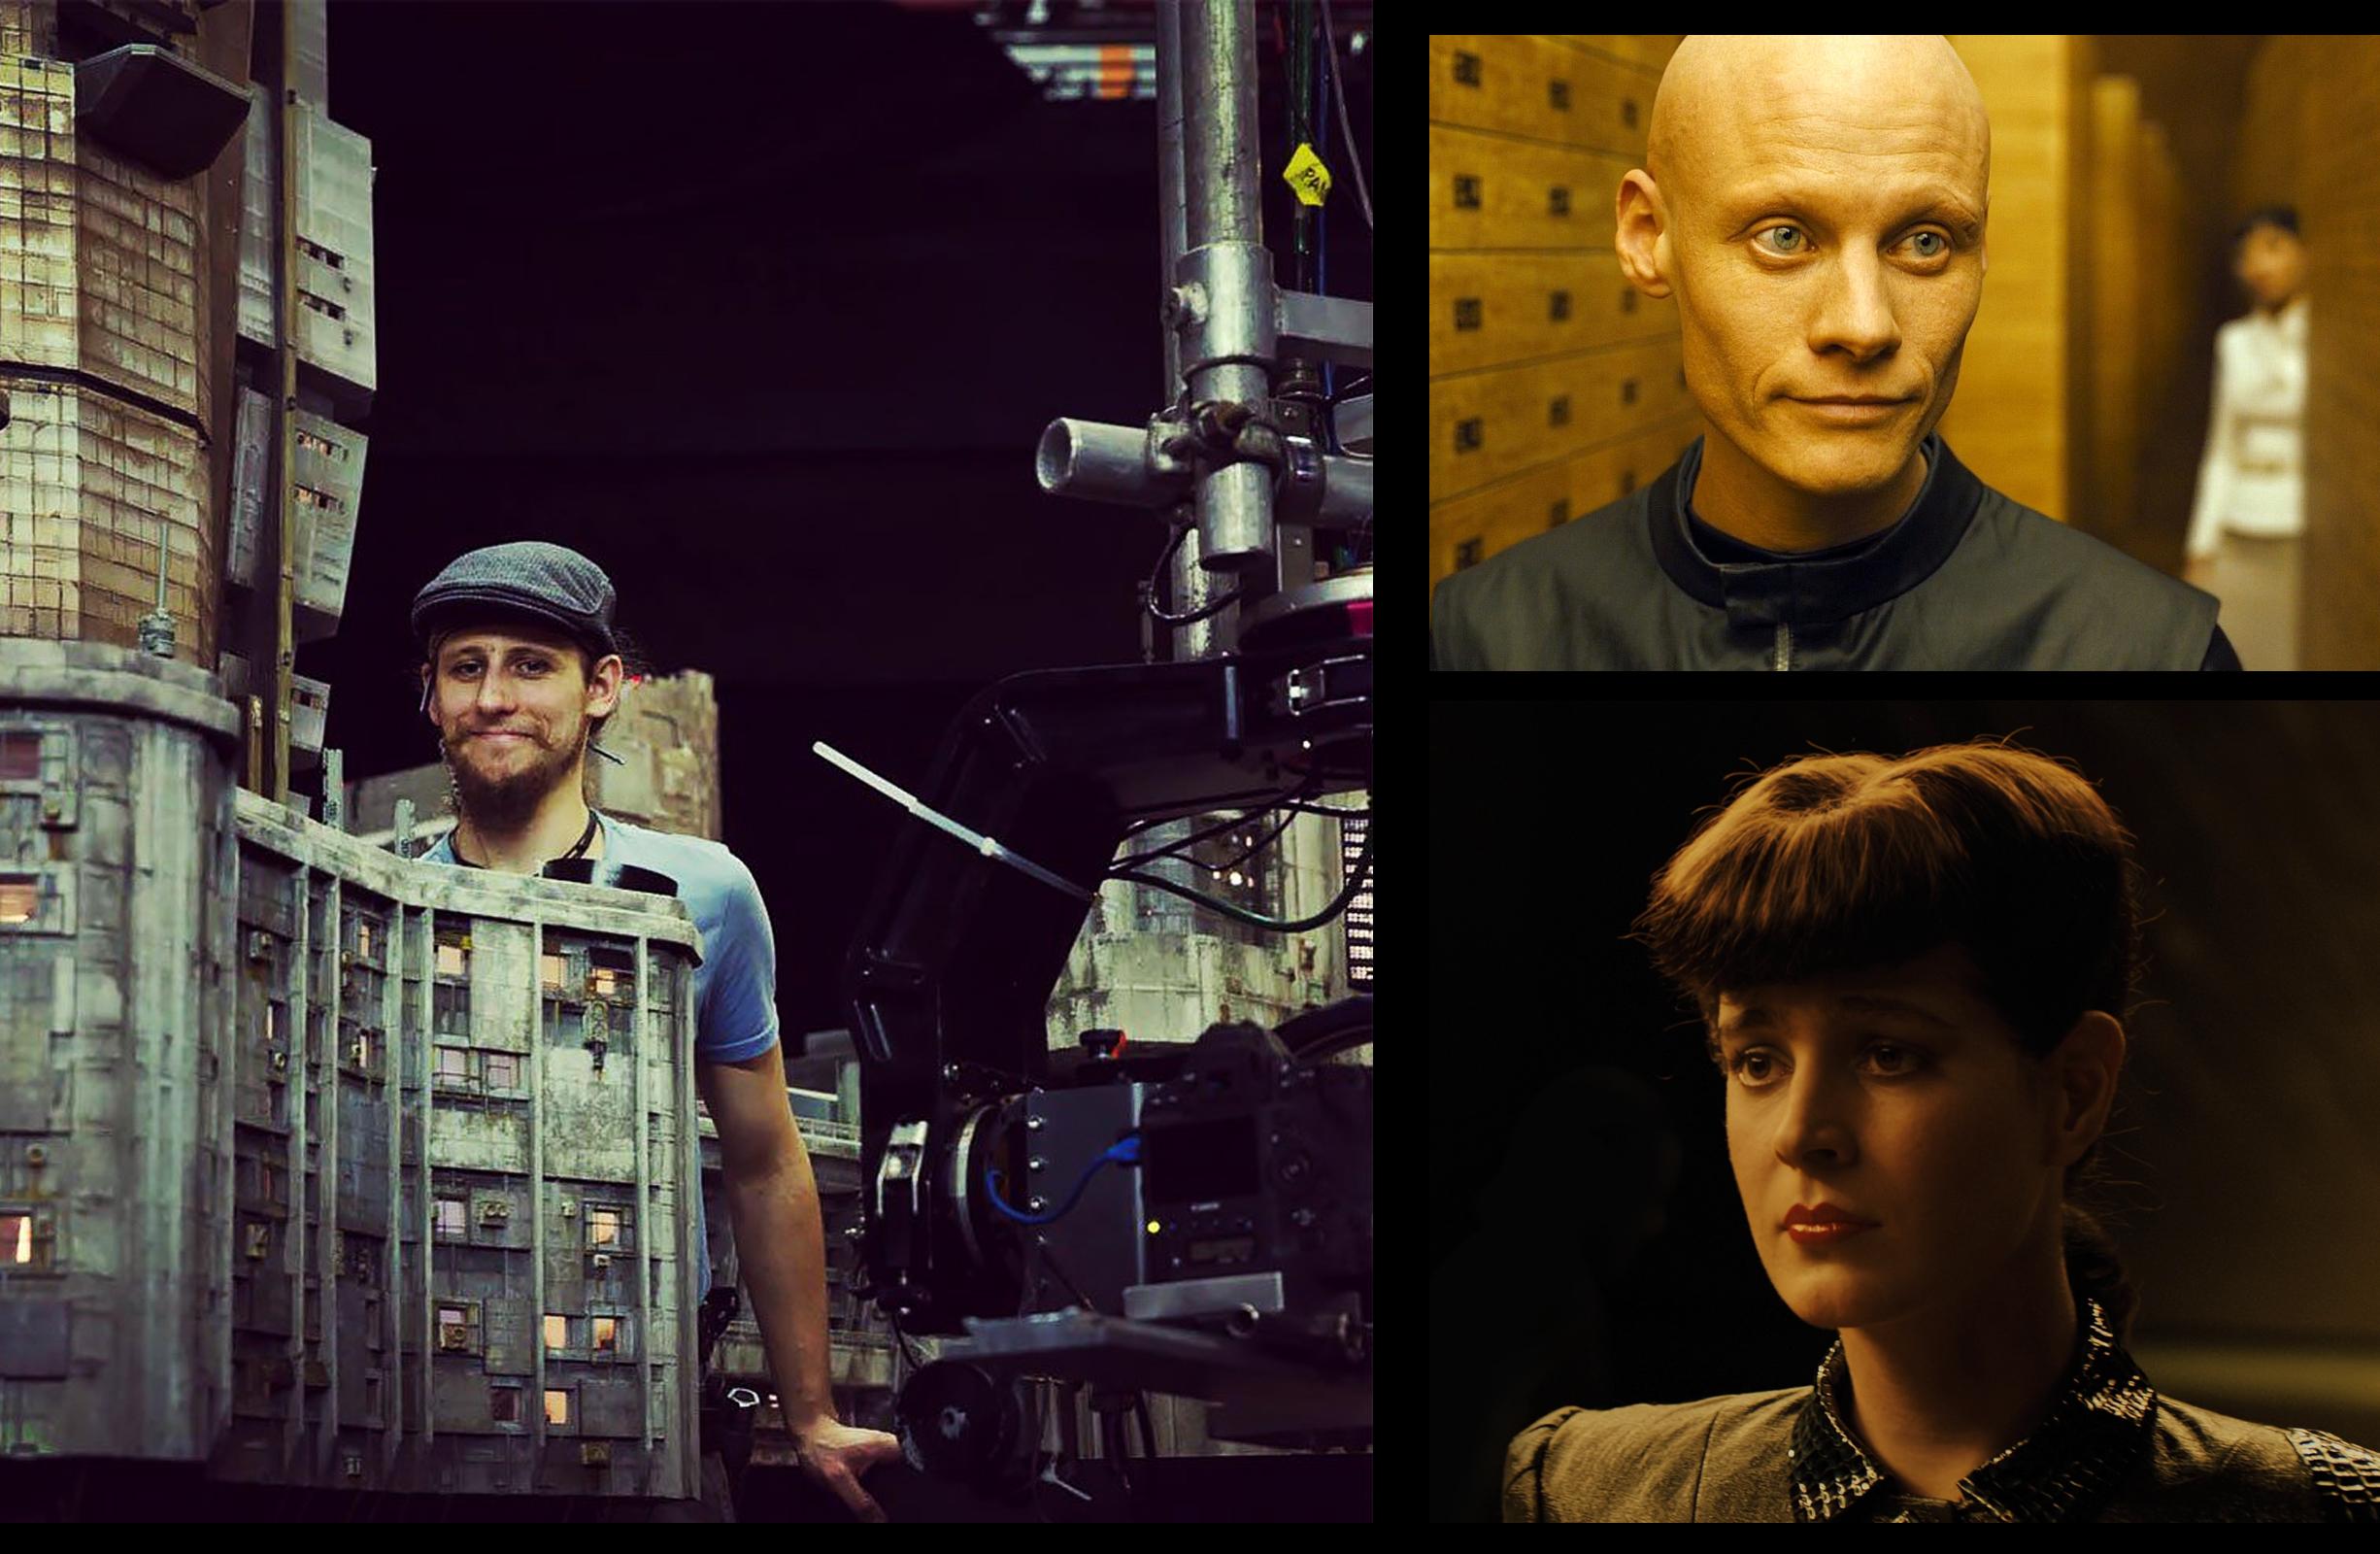 Chris Menges of Weta Workshop. Tomas LeMarquis. Loren Peta as Rachael 2.0.